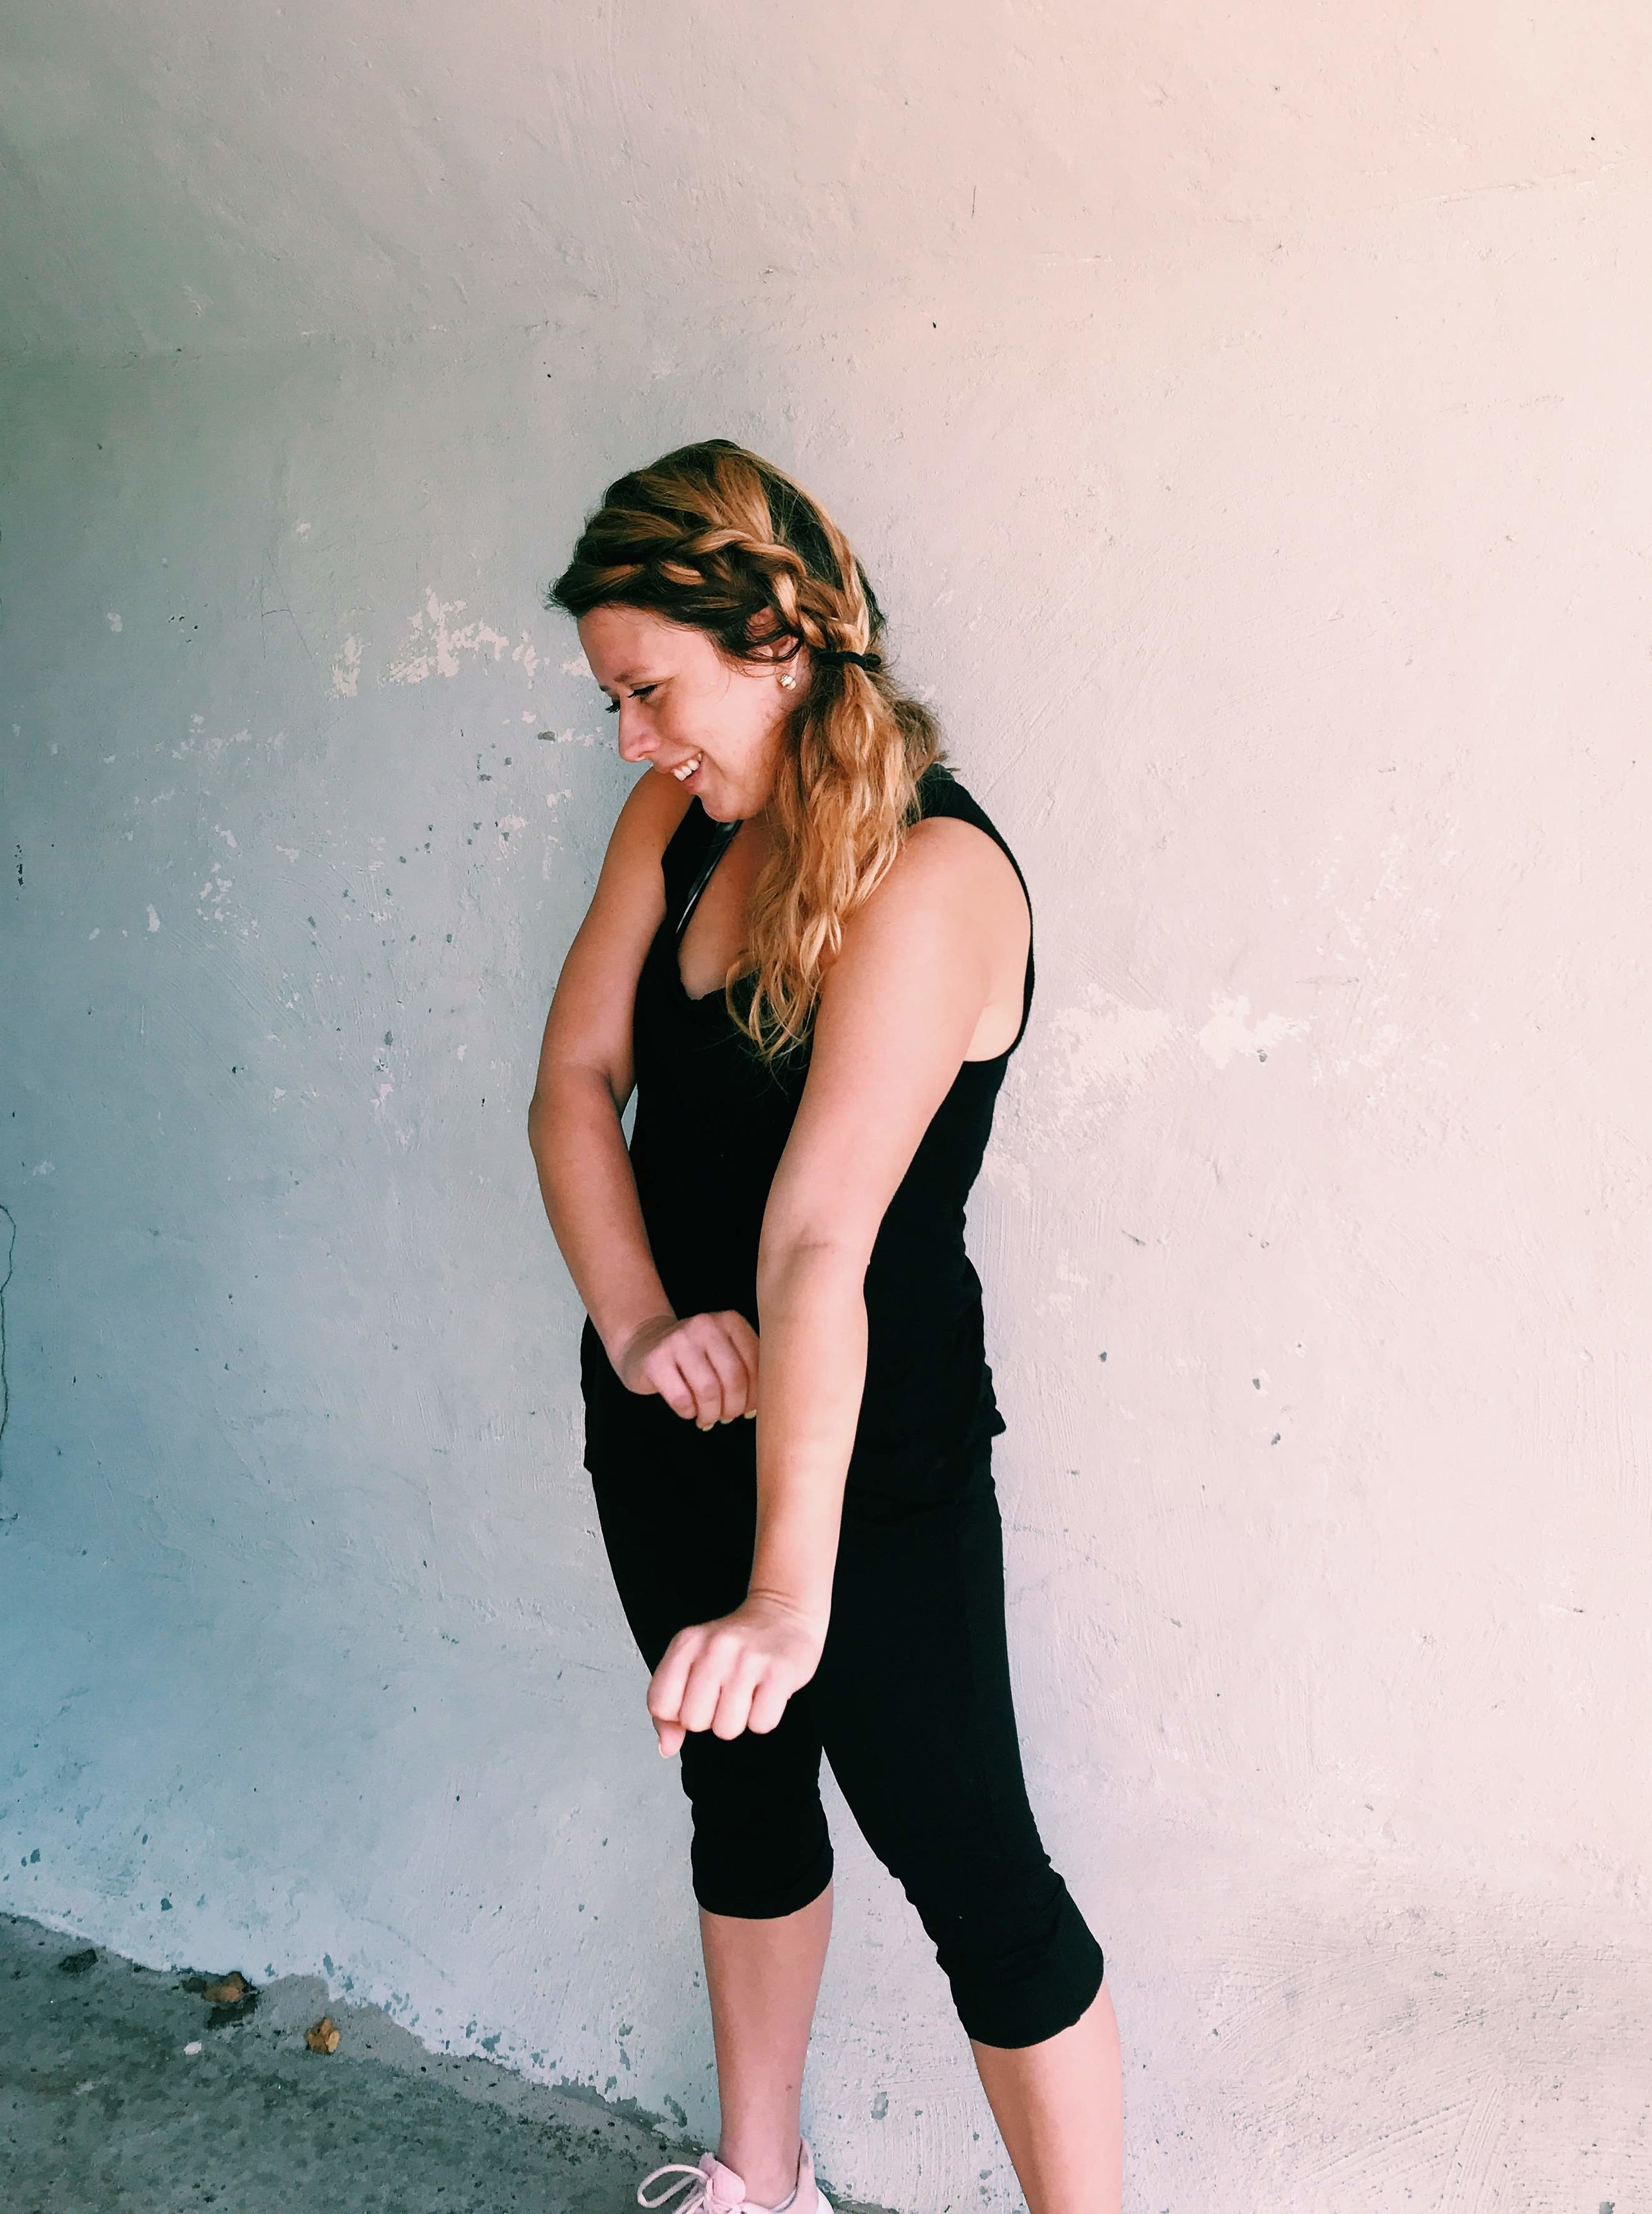 Three Heel Clicks - One Month of BBG (5).jpg